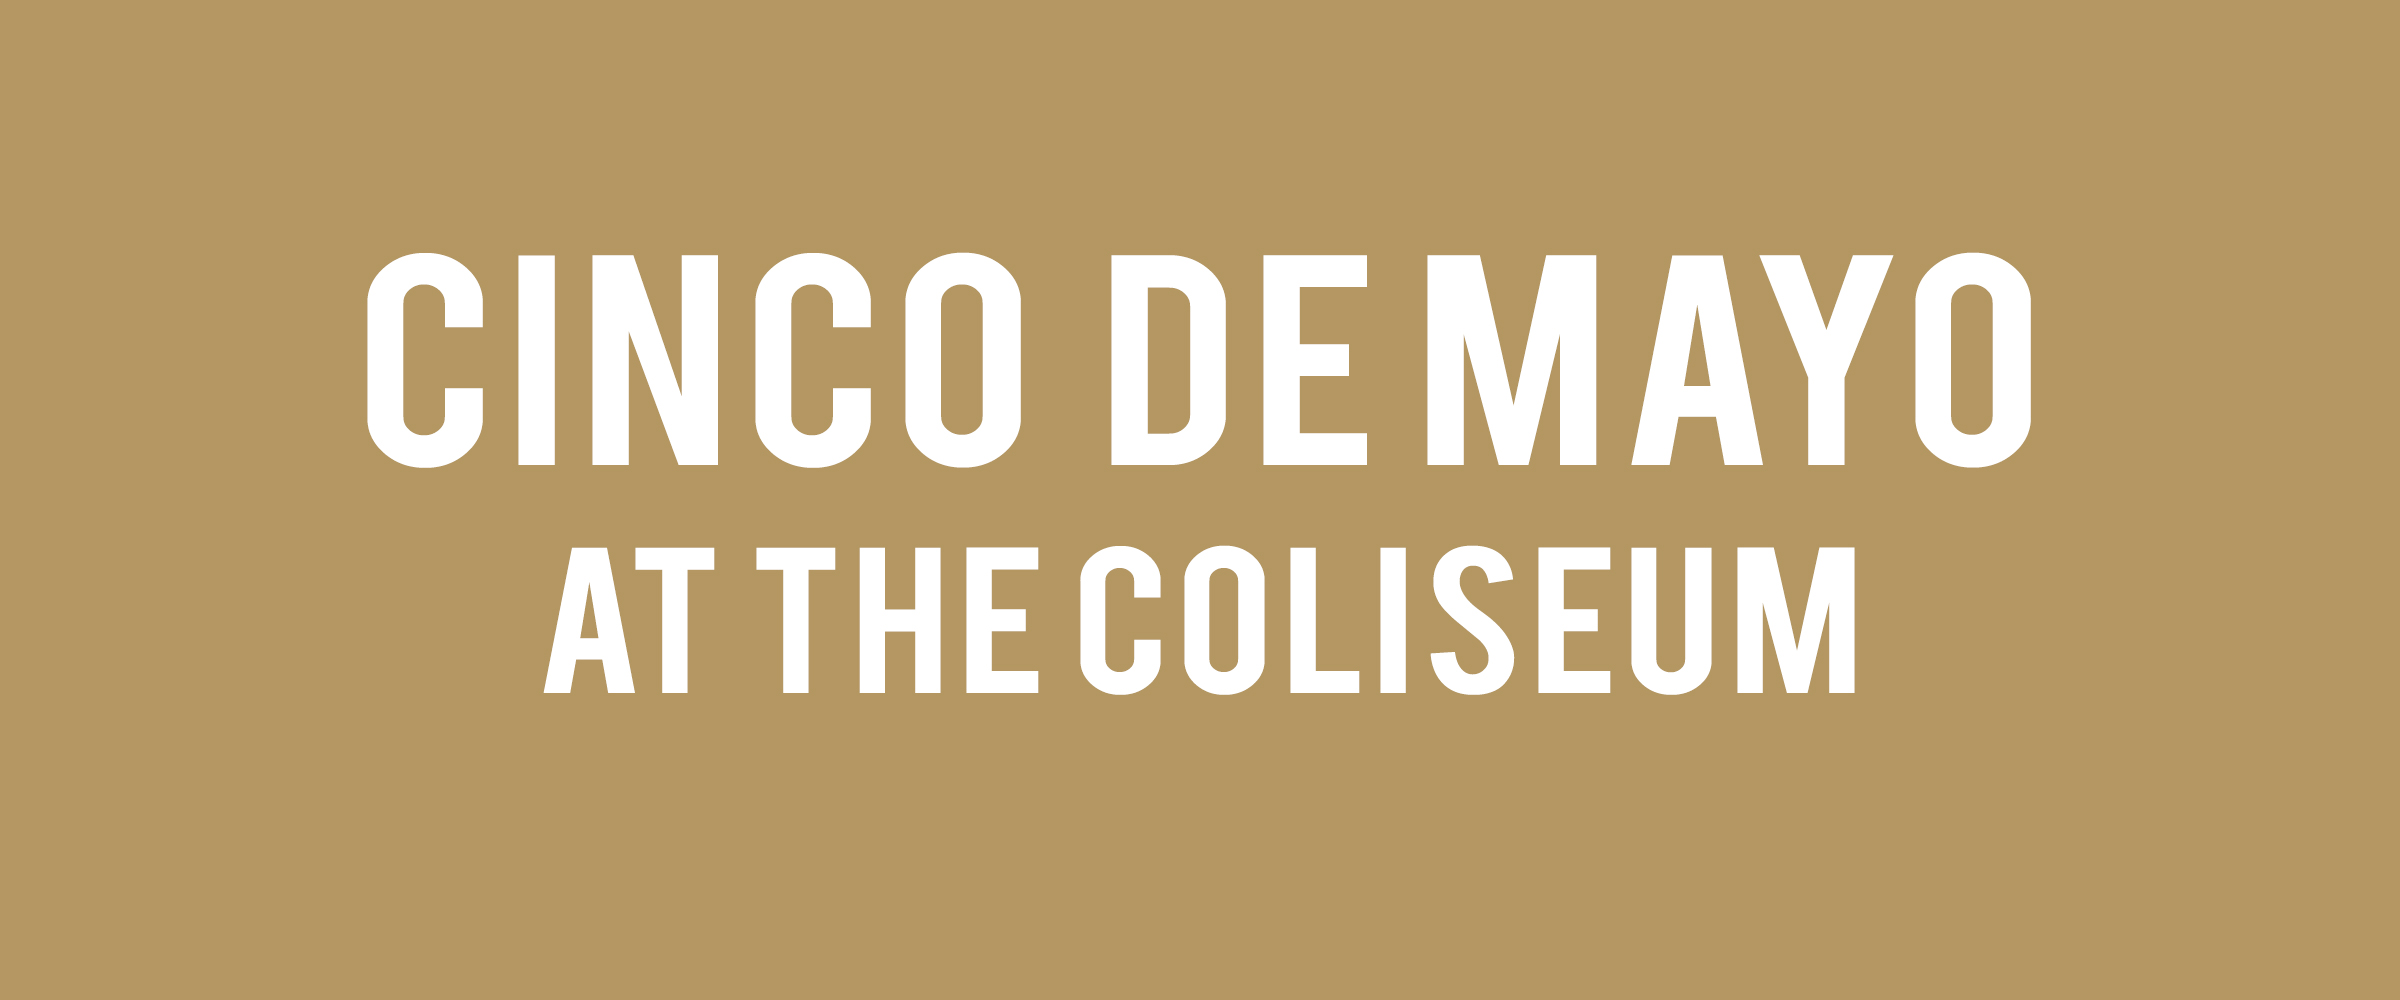 Cinco de Mayo at the Coliseum